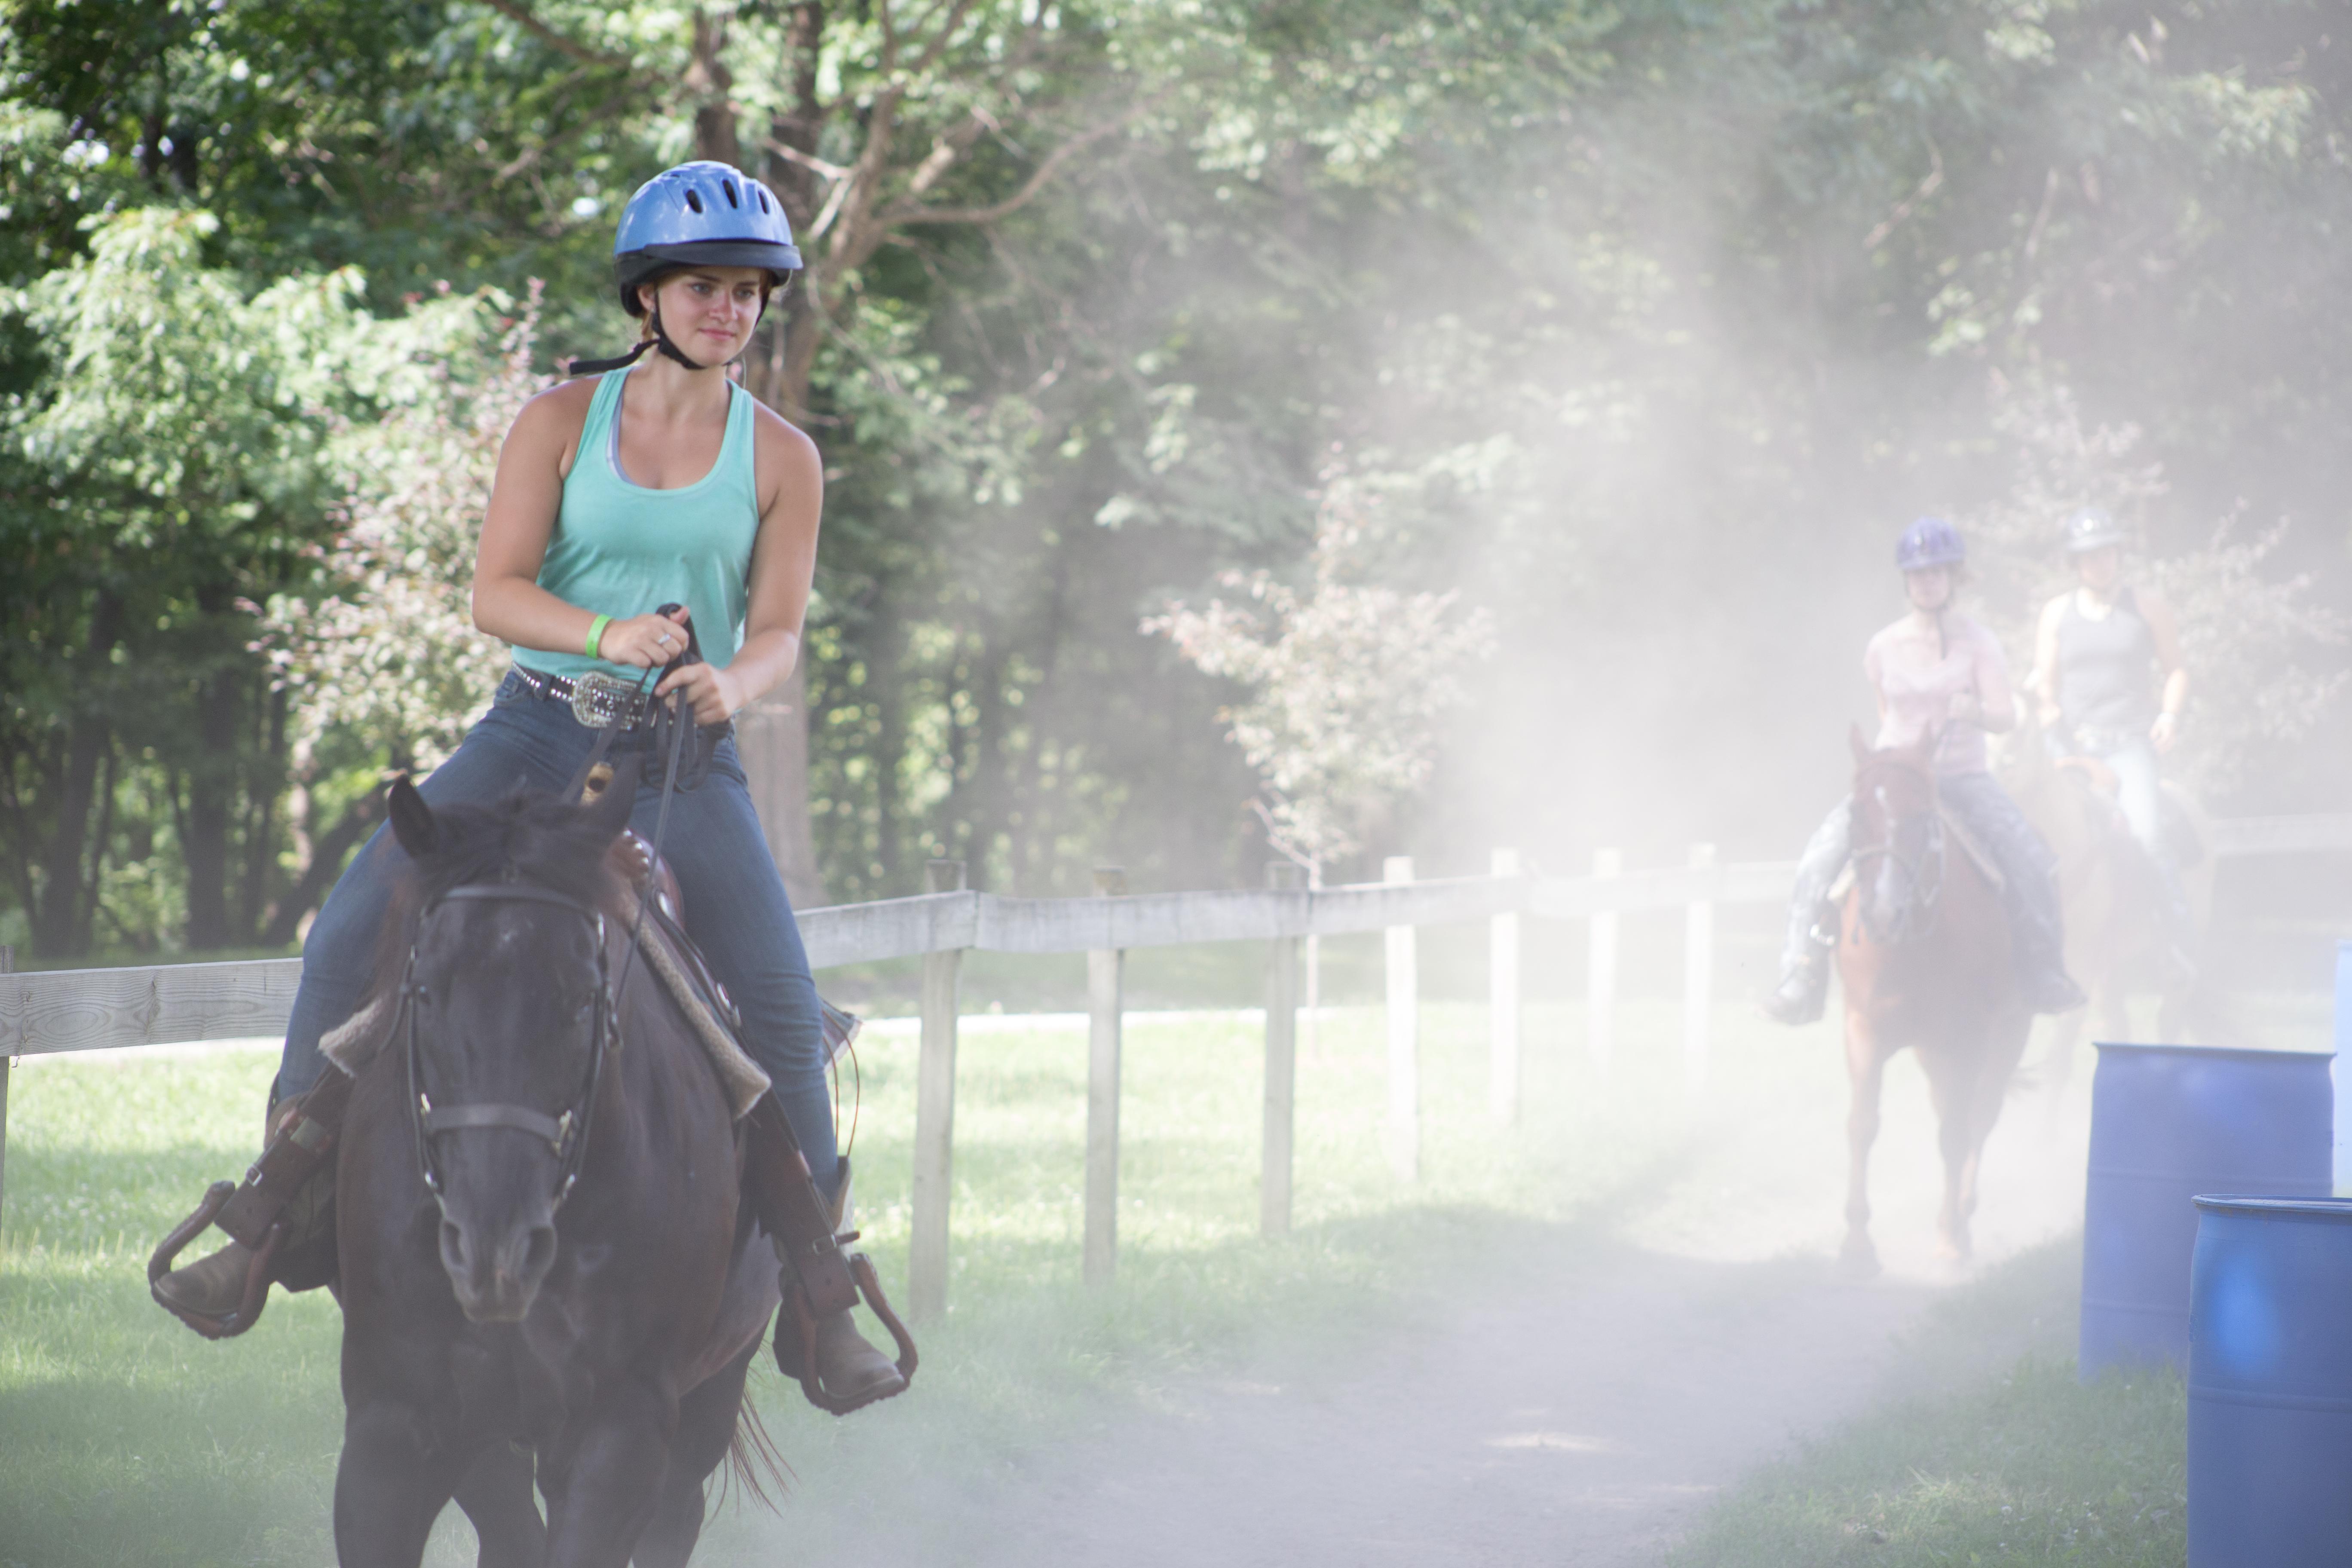 Ride horses!